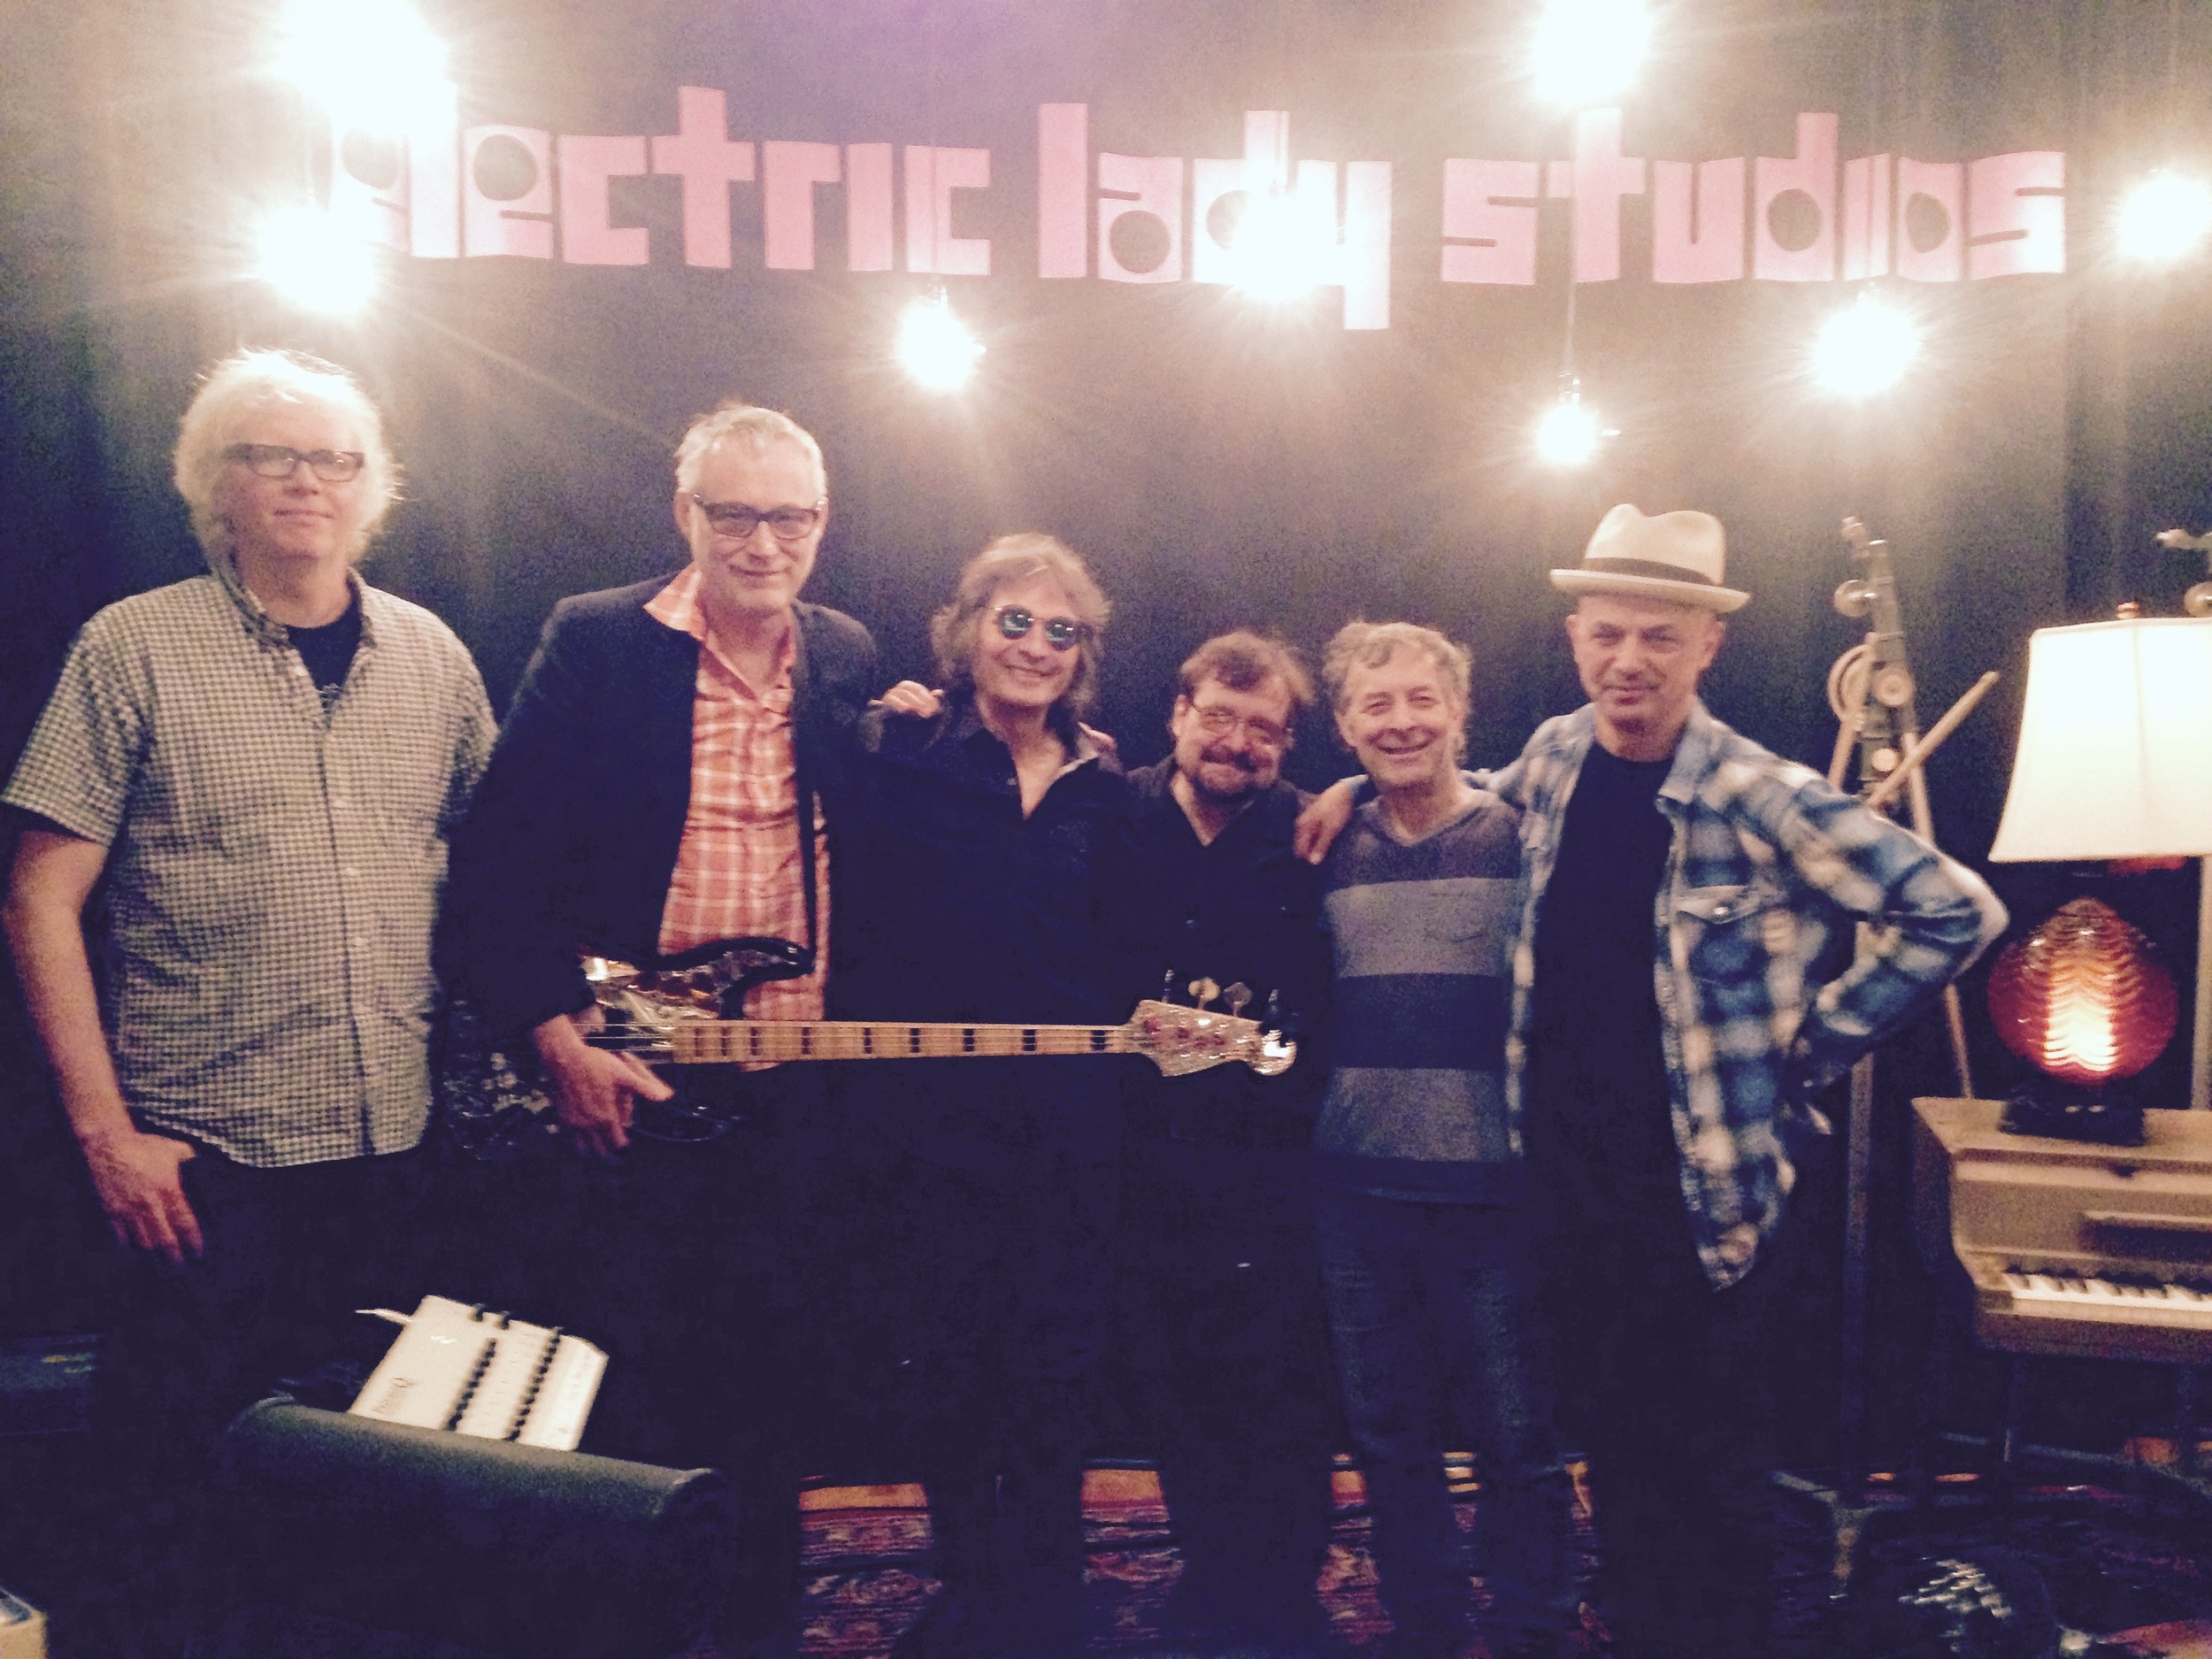 Don Fleming, Joe McGinty, DD, Joe, Albert, and James Mastro. Electric Lady Studios NYC.